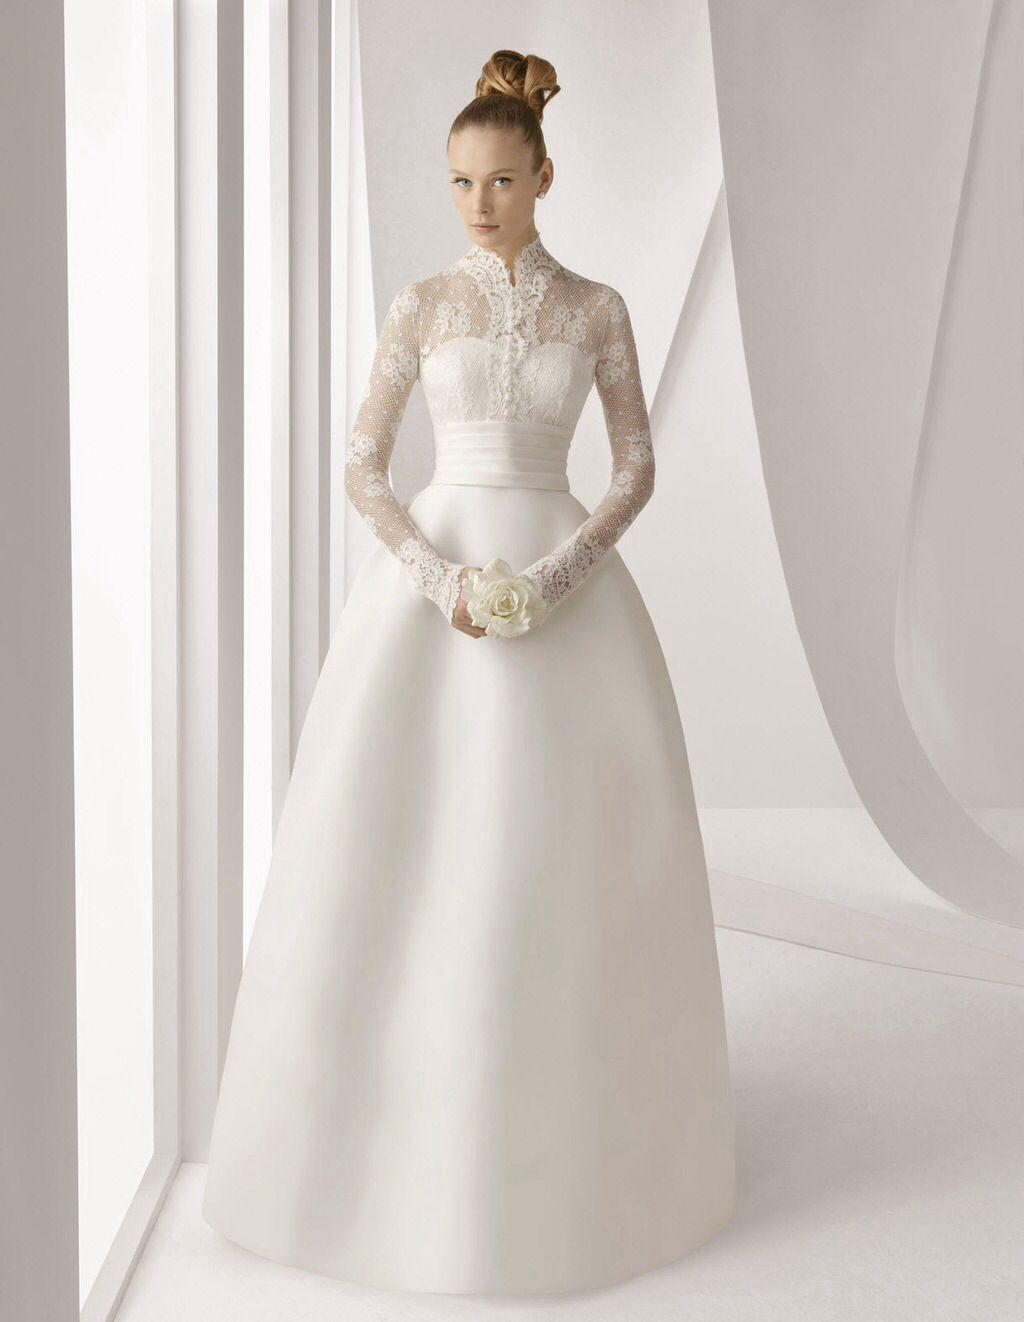 Hijab wedding dresses weddings pinterest wedding dresses